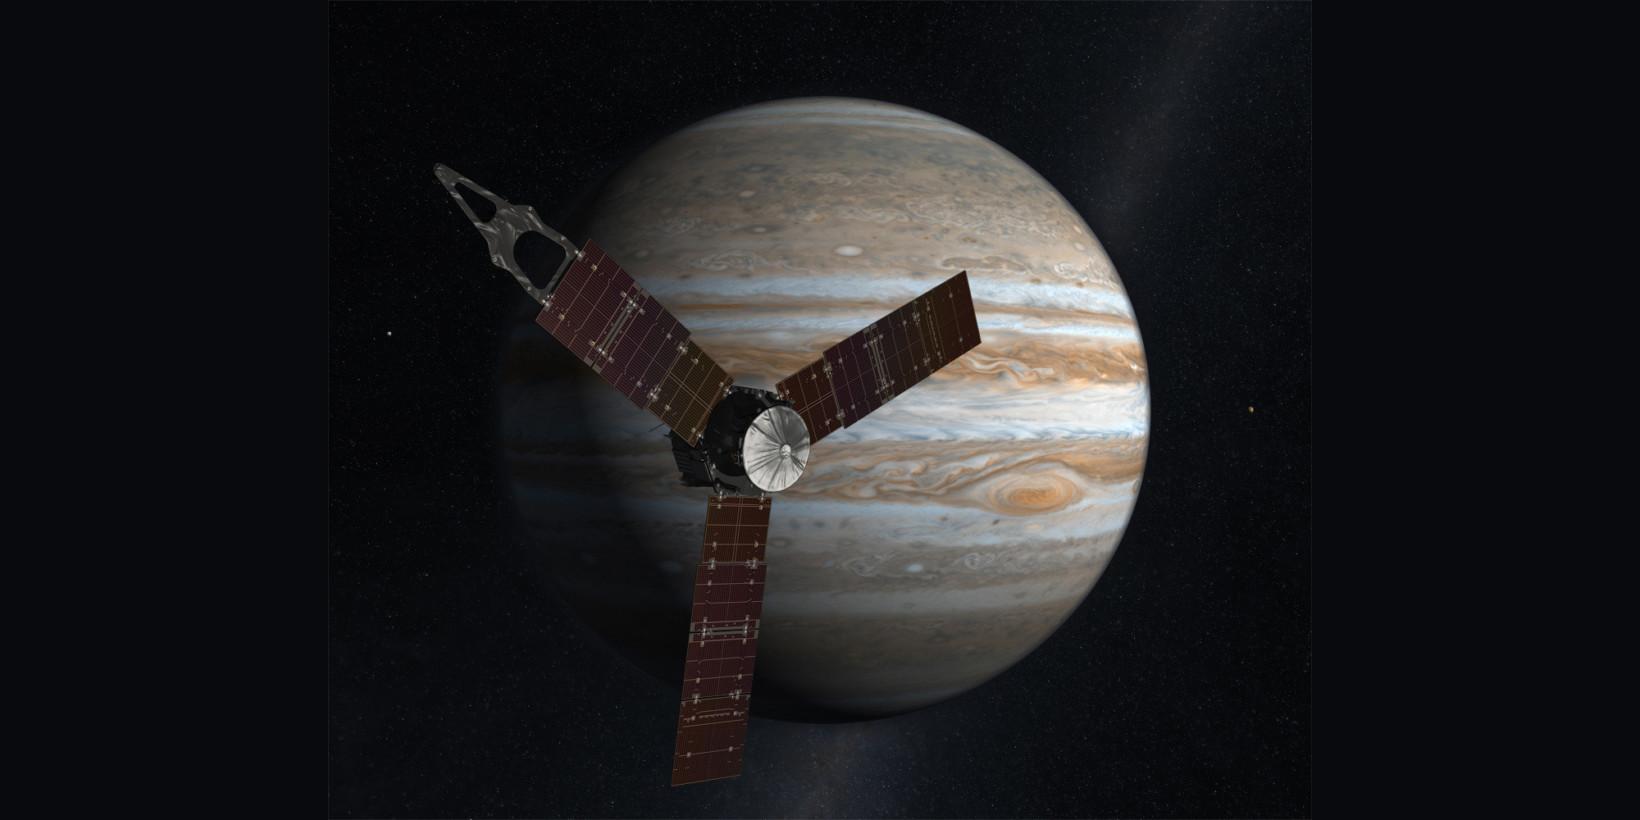 NASA's Juno spaceship is now in Jupiter's orbit